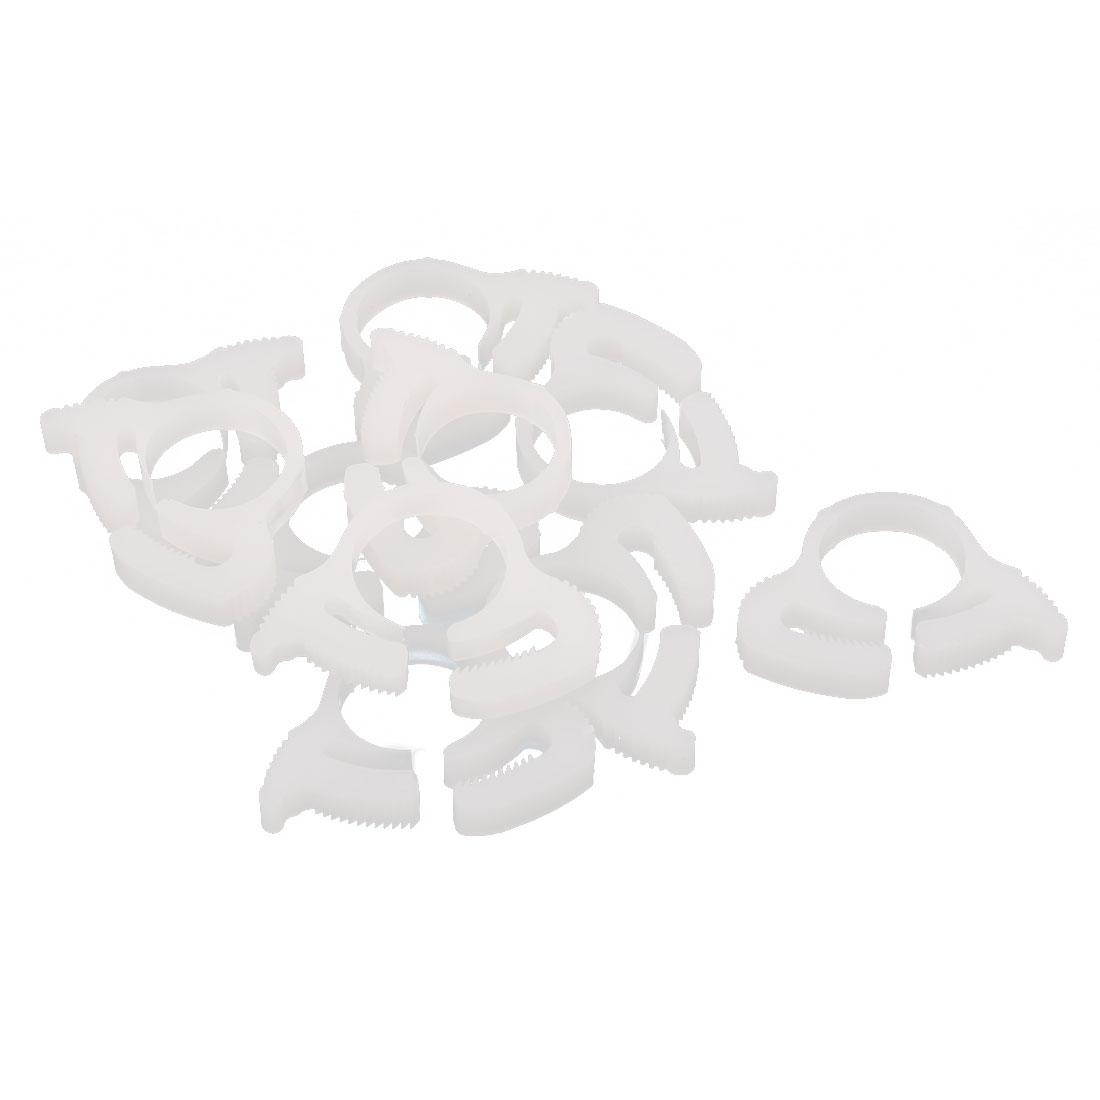 10 Pcs 15.2-17mm Range Plastic Adjustable Band Hose Pipe Fastener Clamp